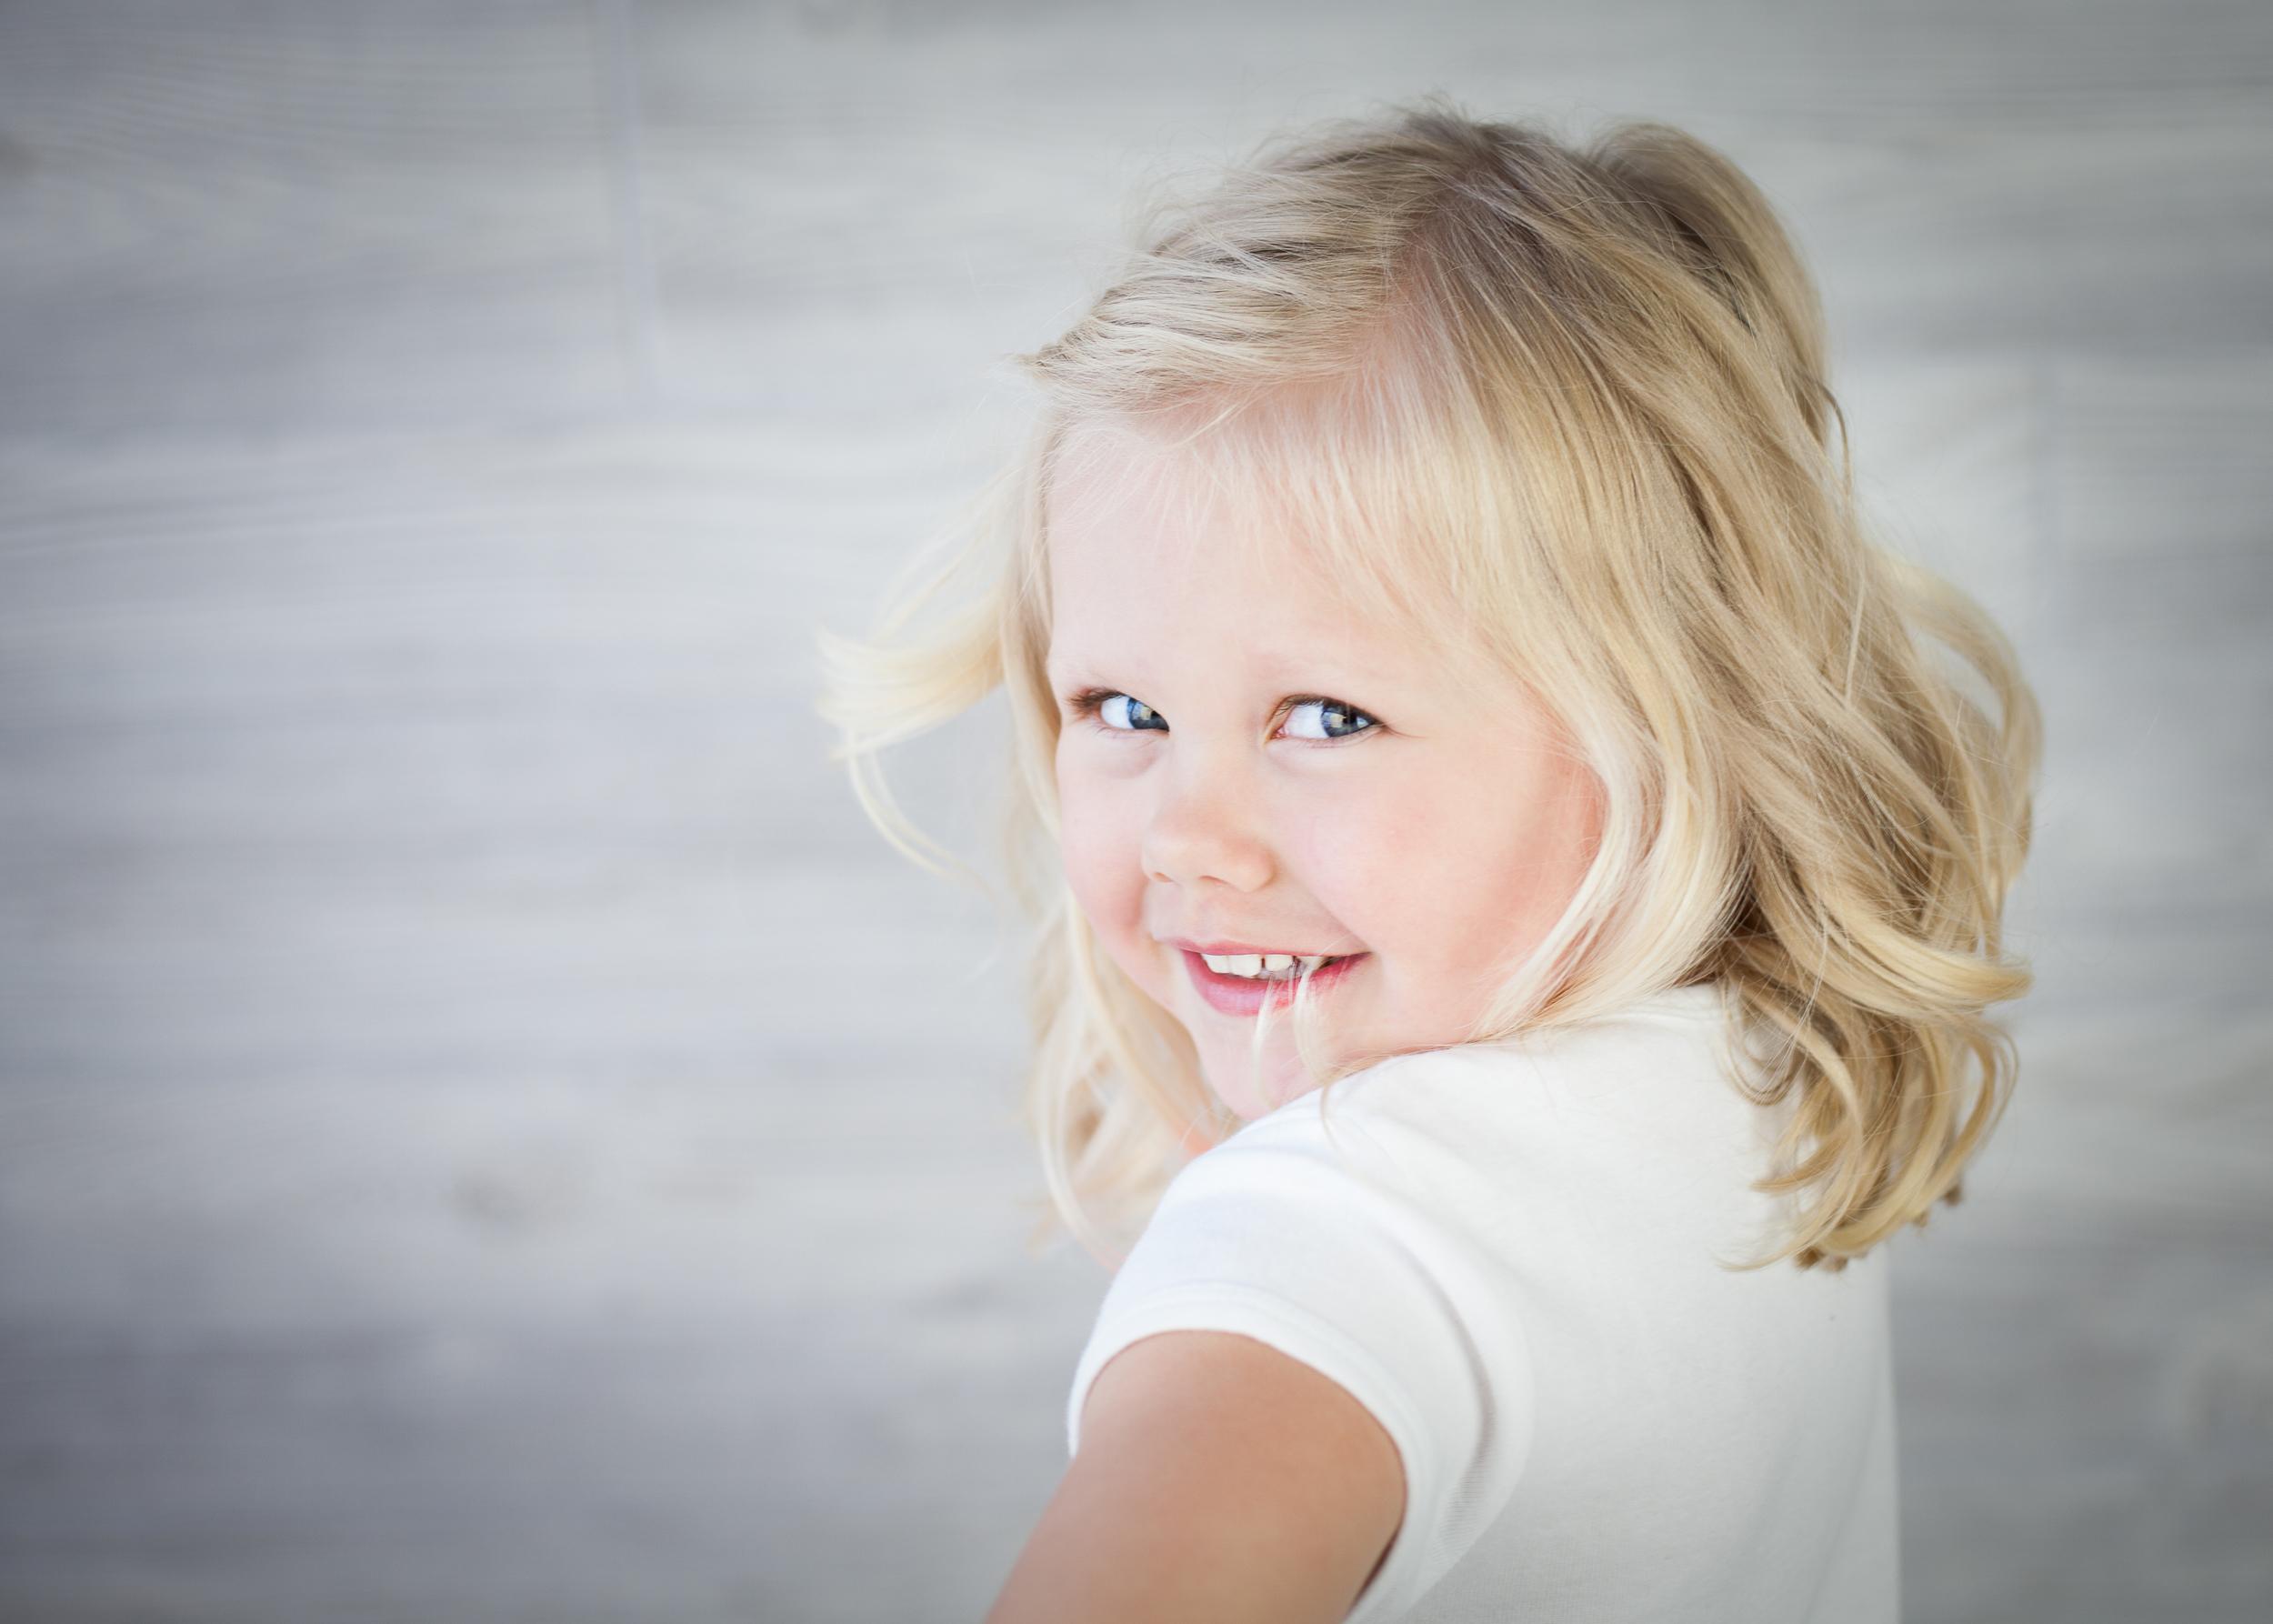 Child Photography - Fargo, ND